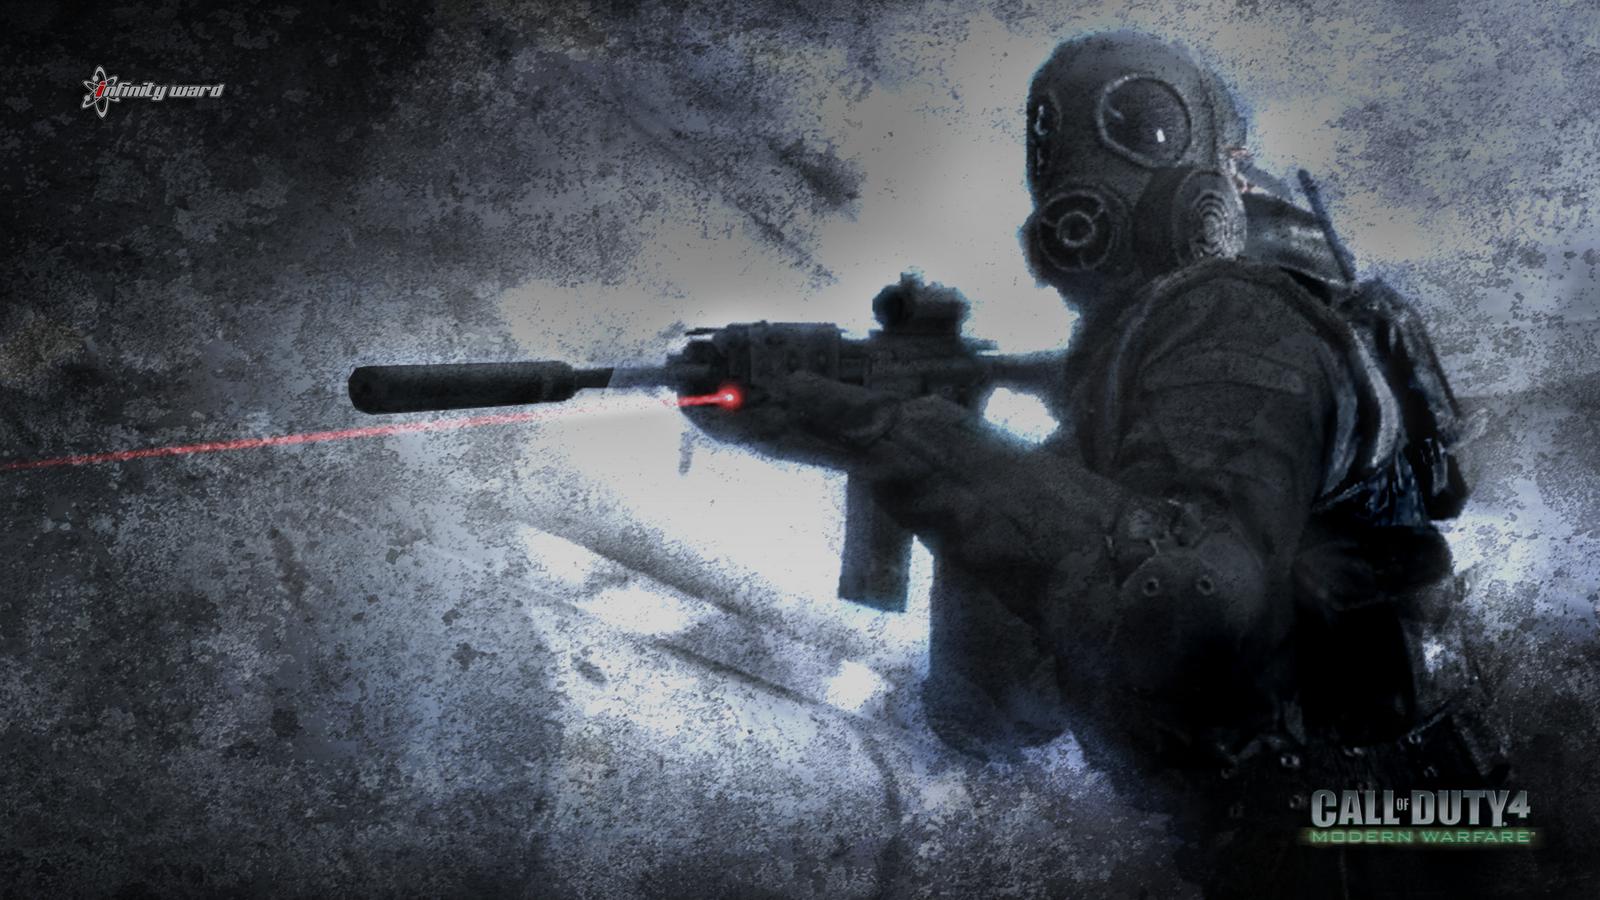 Free Download Download Call Of Duty Modern Warfare 4 Hd Wallpapers